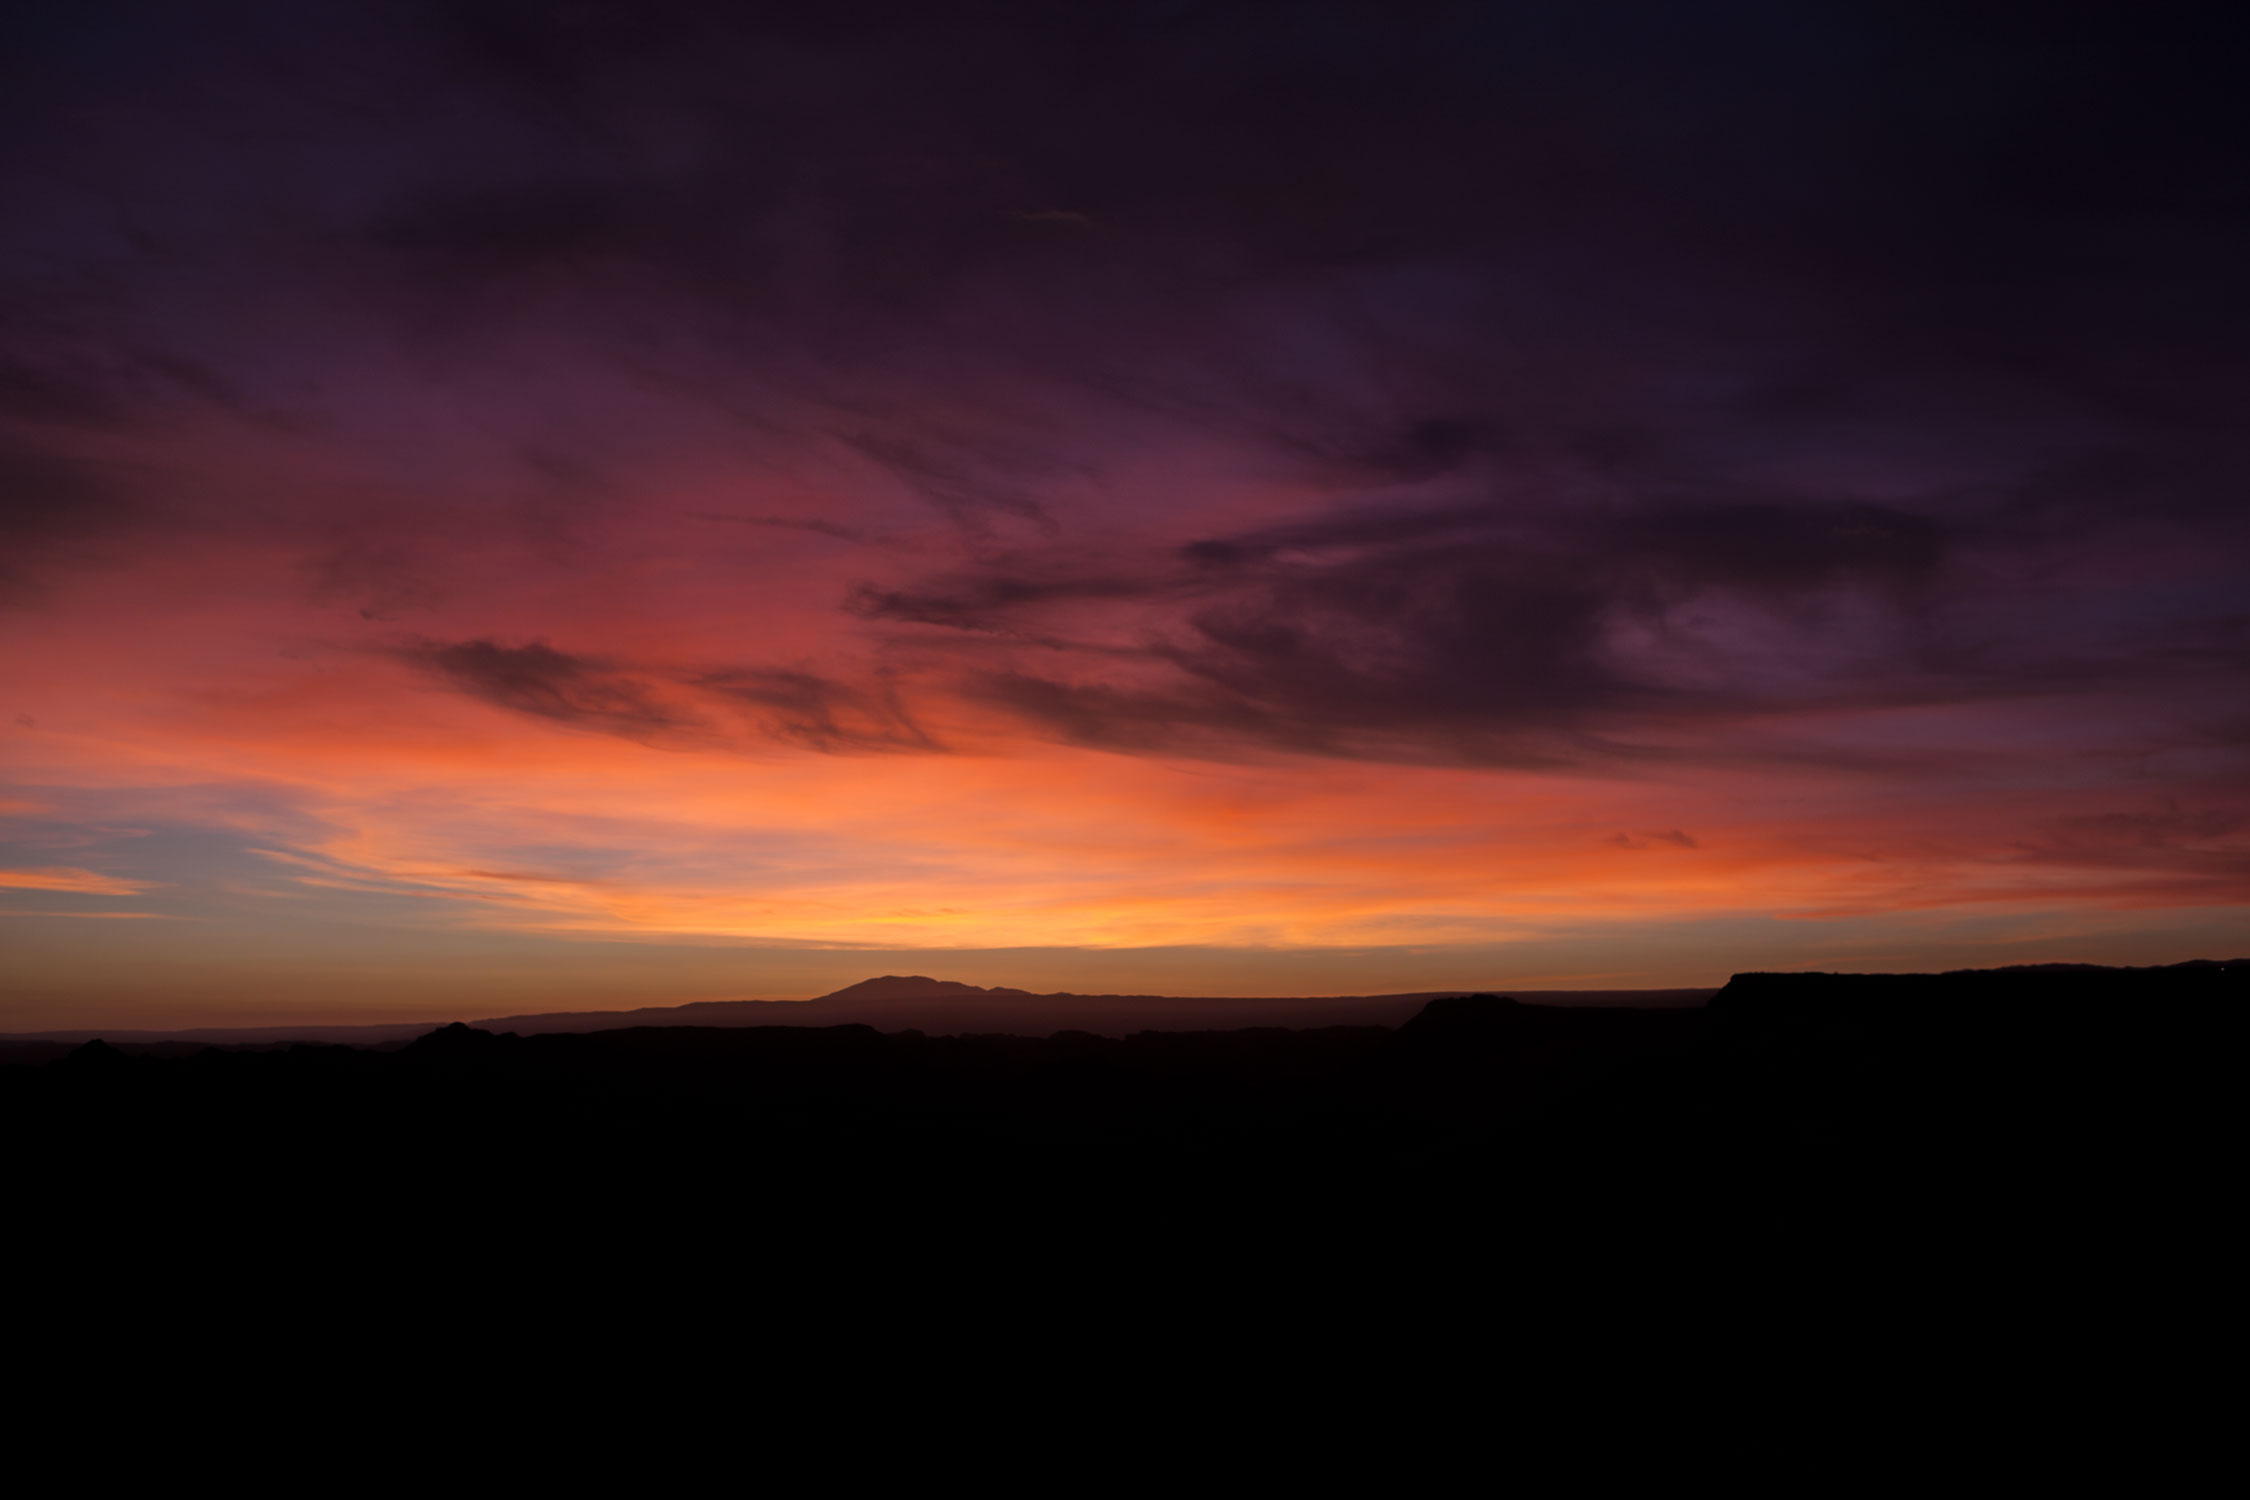 atacama-desert-chile-wander-south-valle-de-luna-sunset.jpg